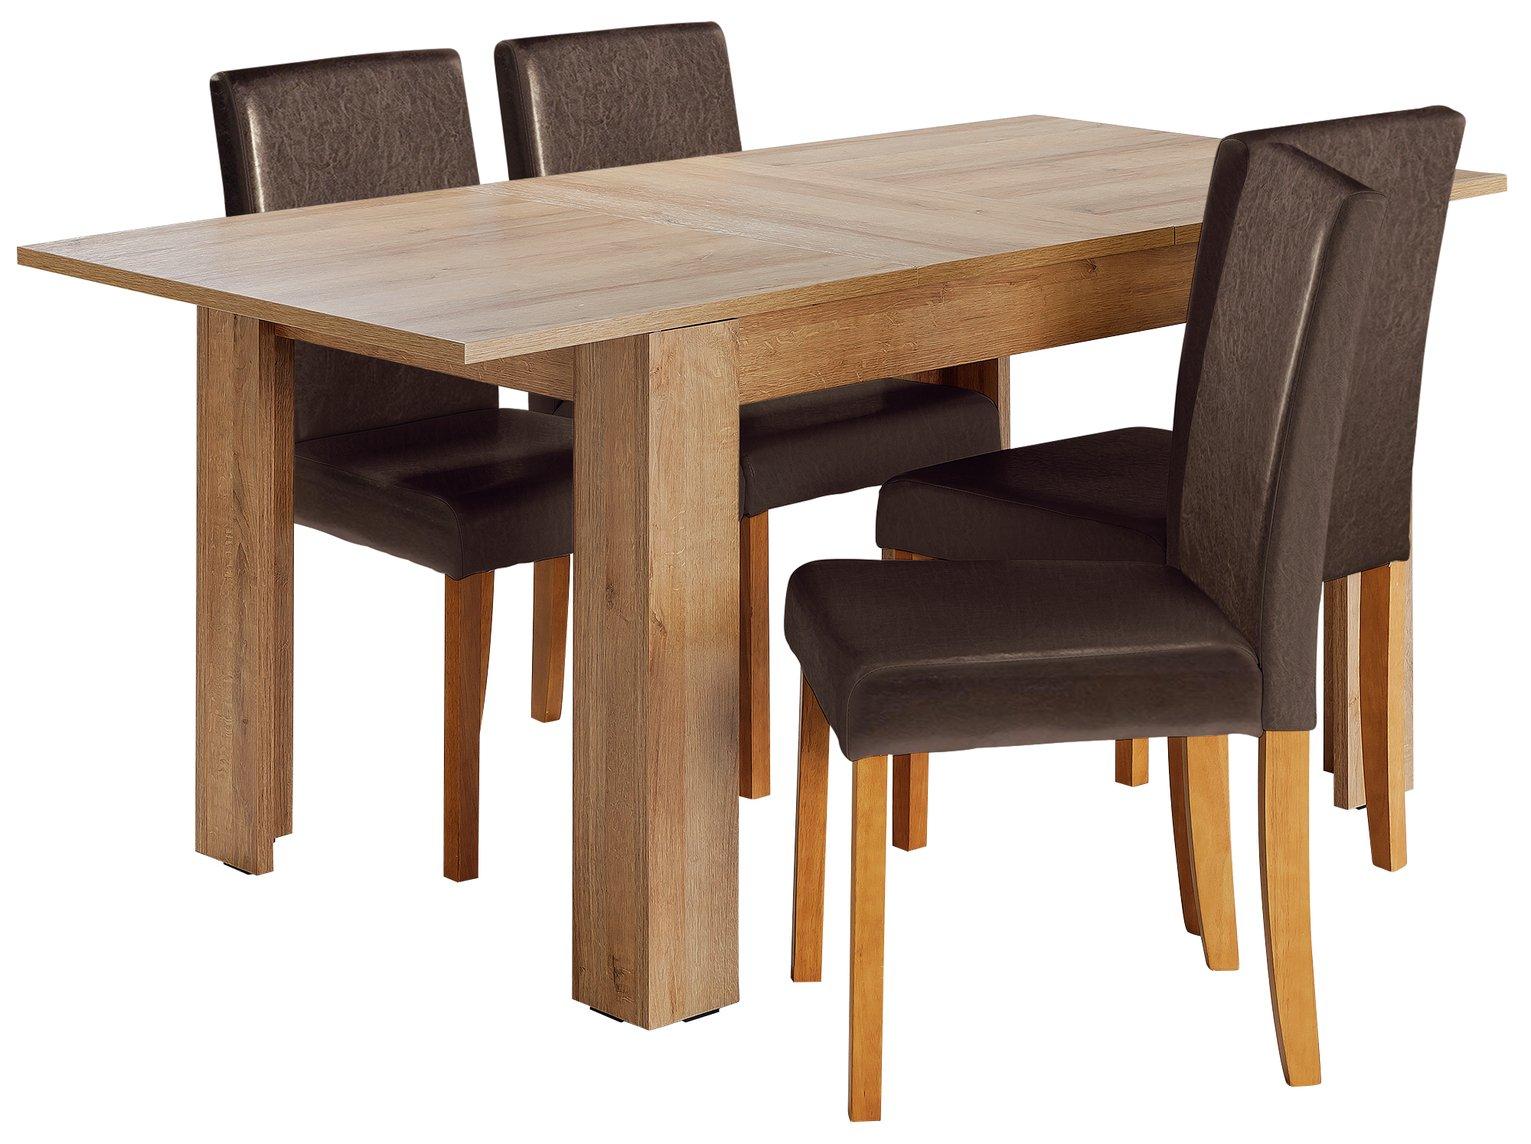 HOME Miami Extendable Oak Veneer Table & 4 Chairs - Choc